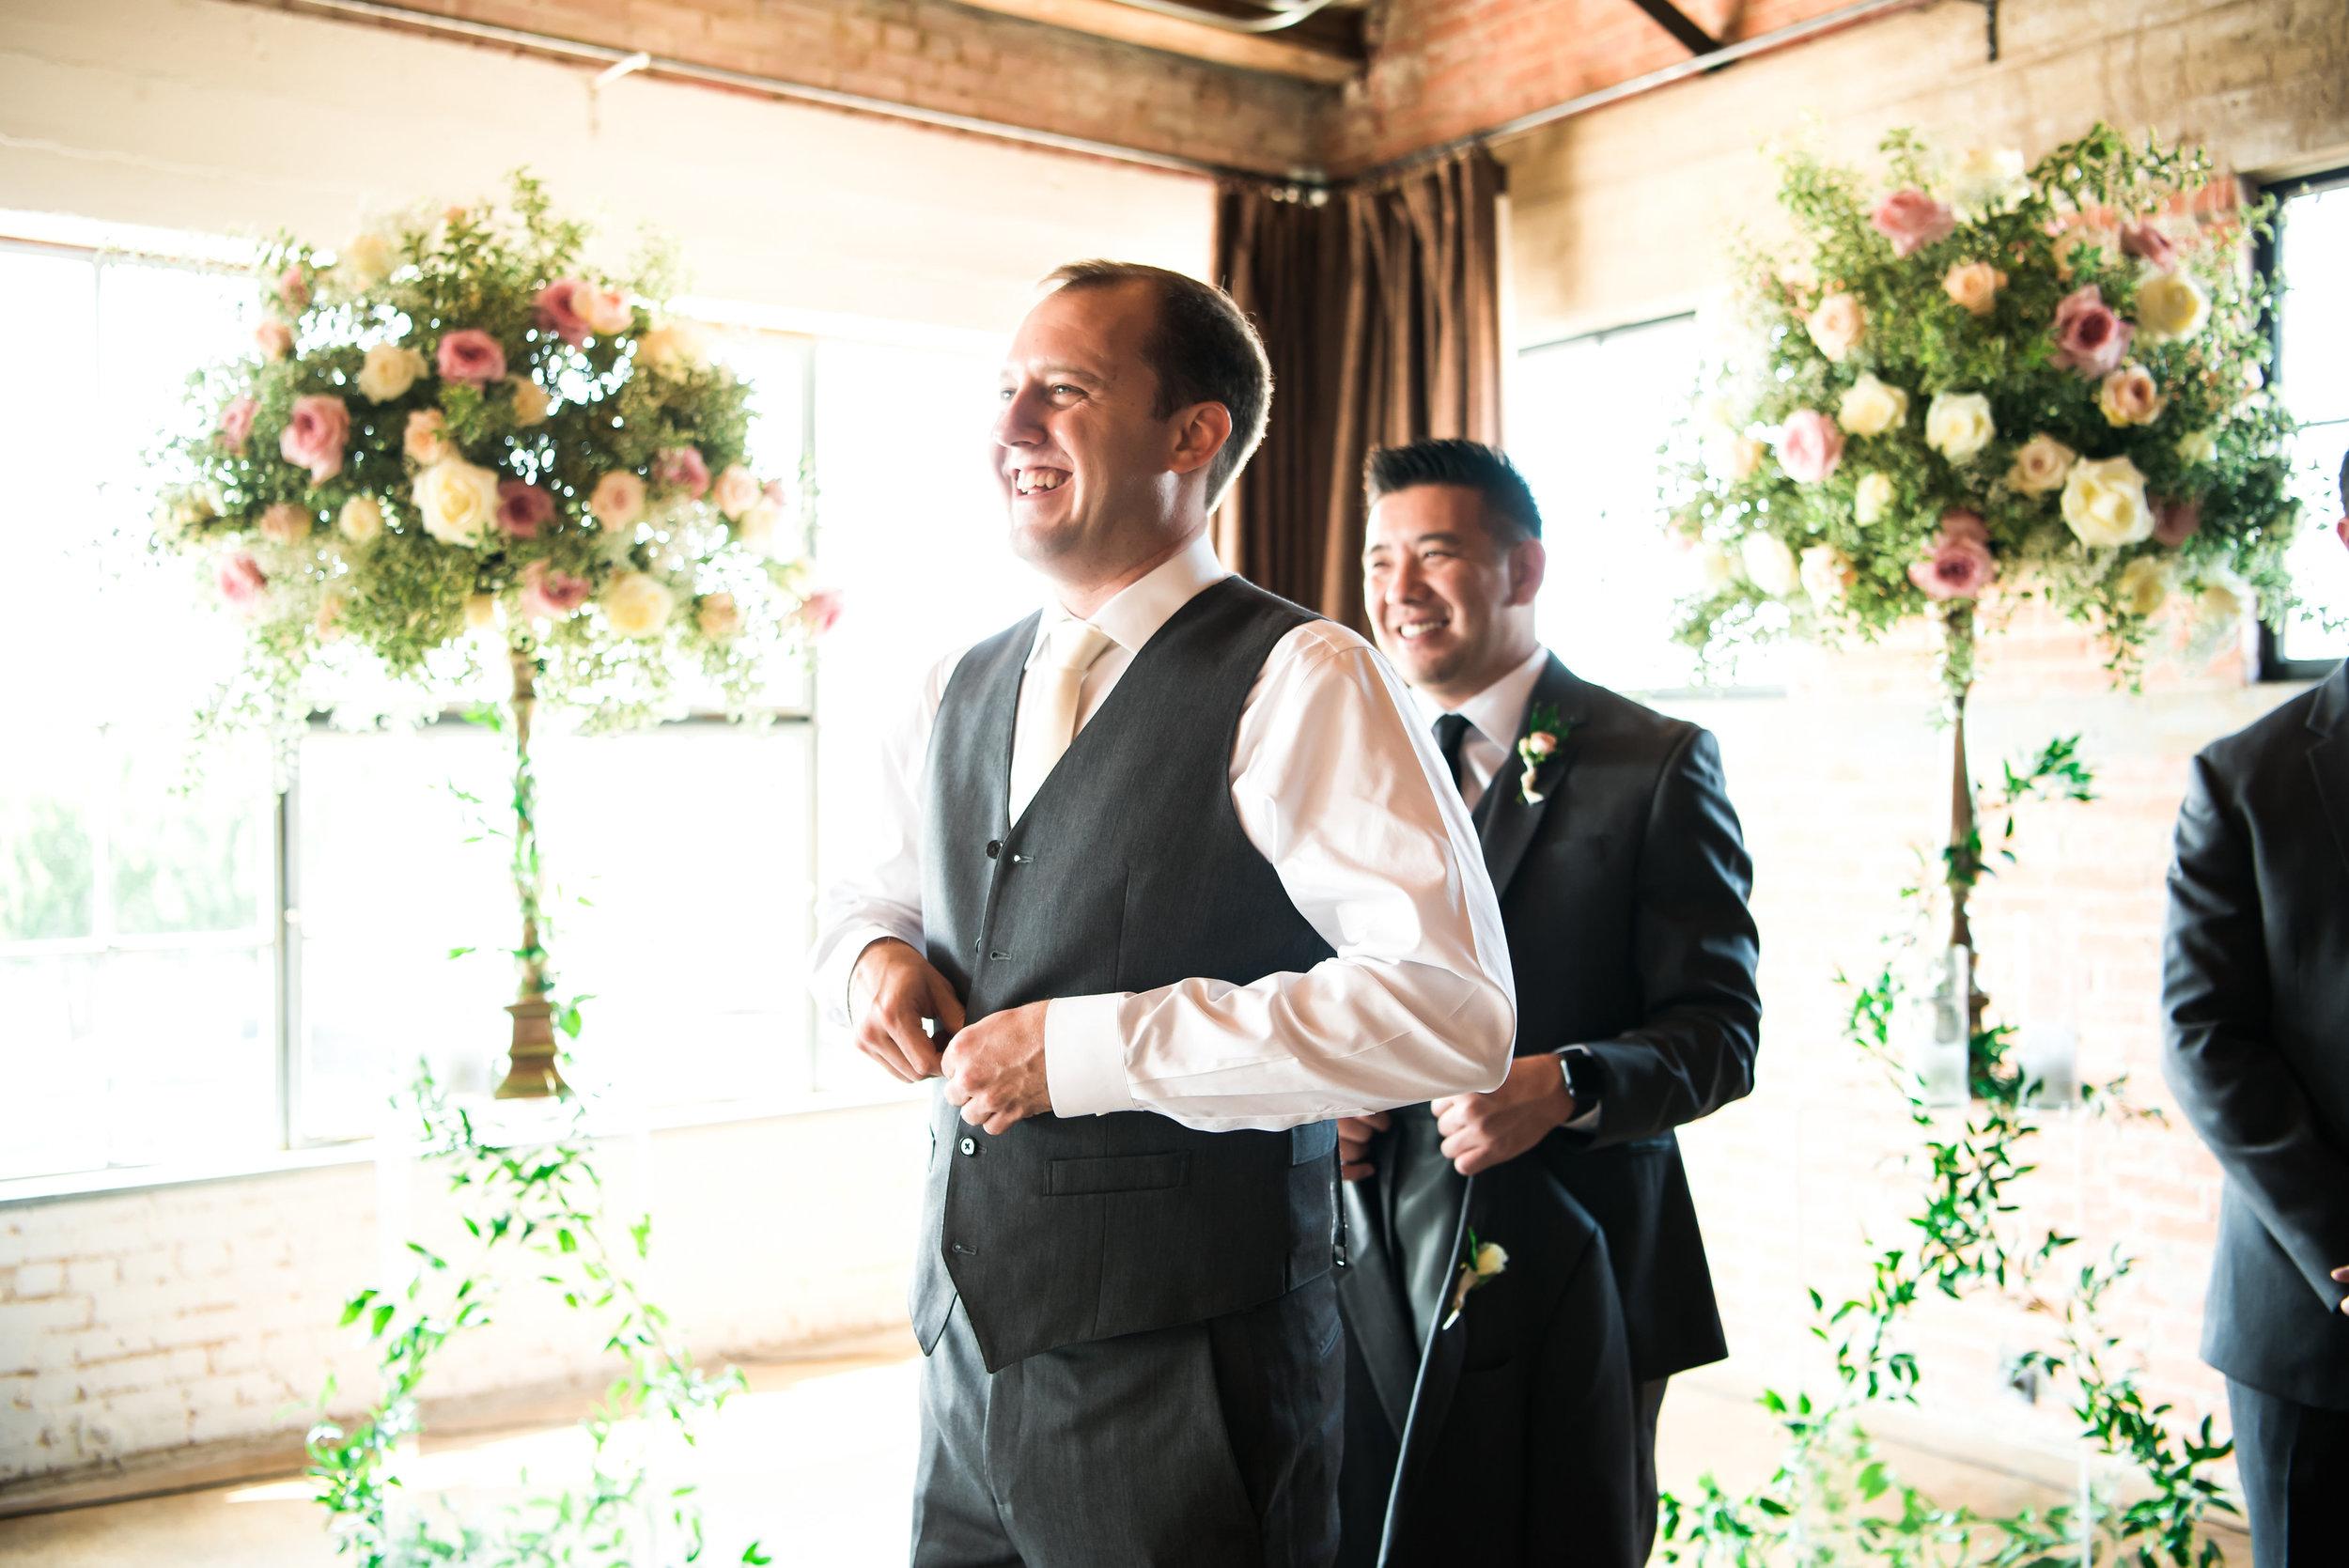 dallas_wedding_photographer-86.jpg